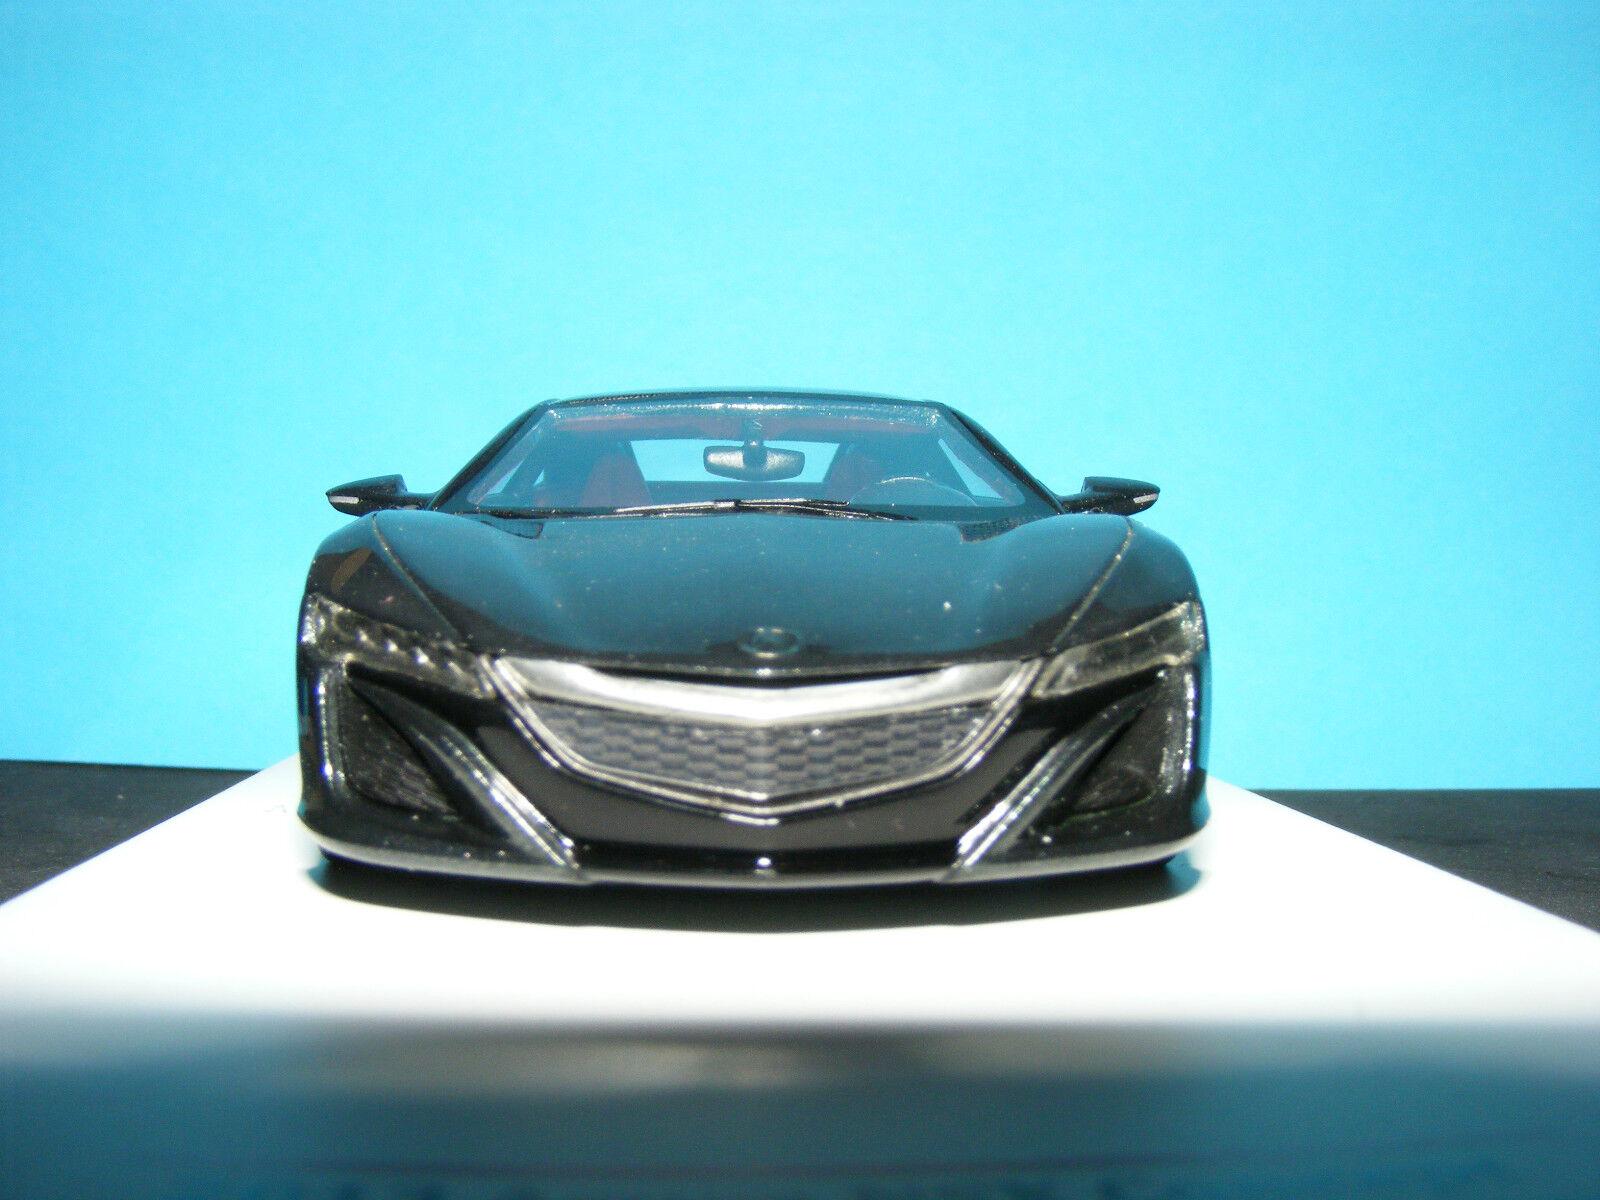 Honda Acura NSX Concept II 1 43 New New New True Scale assez rare N. American Auto Show. 0a3443